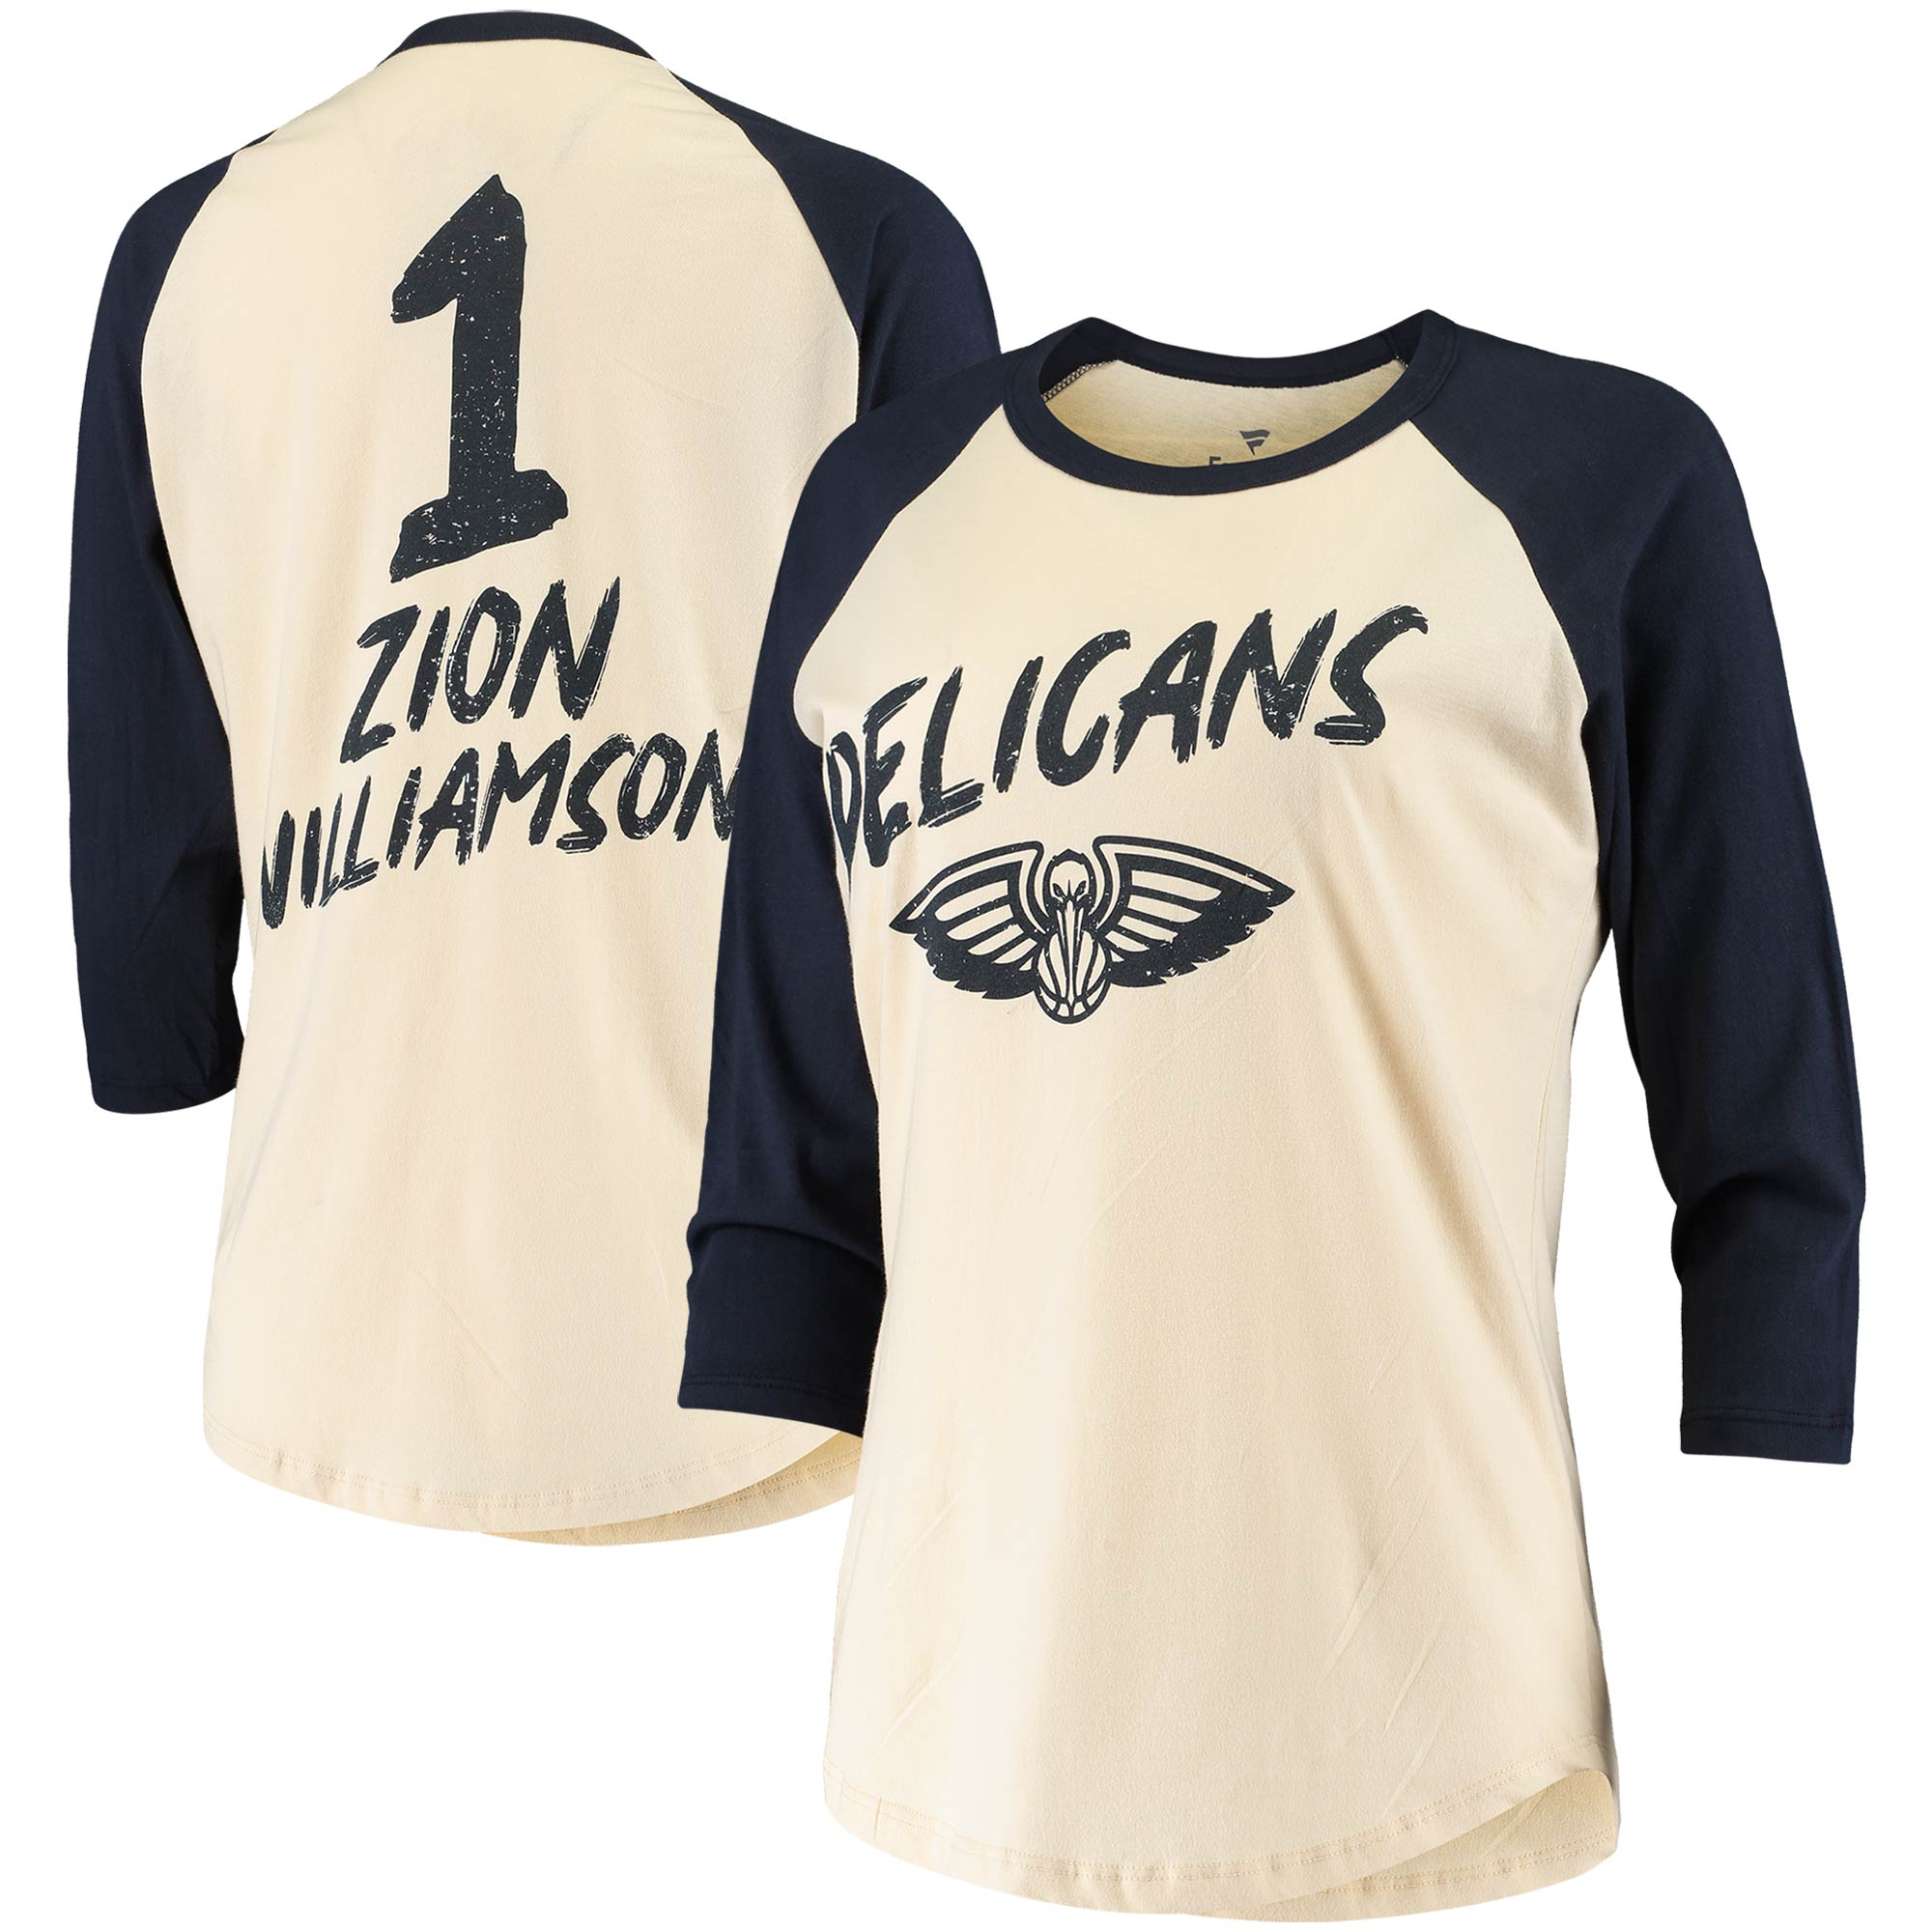 Zion Williamson New Orleans Pelicans Fanatics Branded Women's Raglan 3/4-Sleeve T-Shirt - Cream